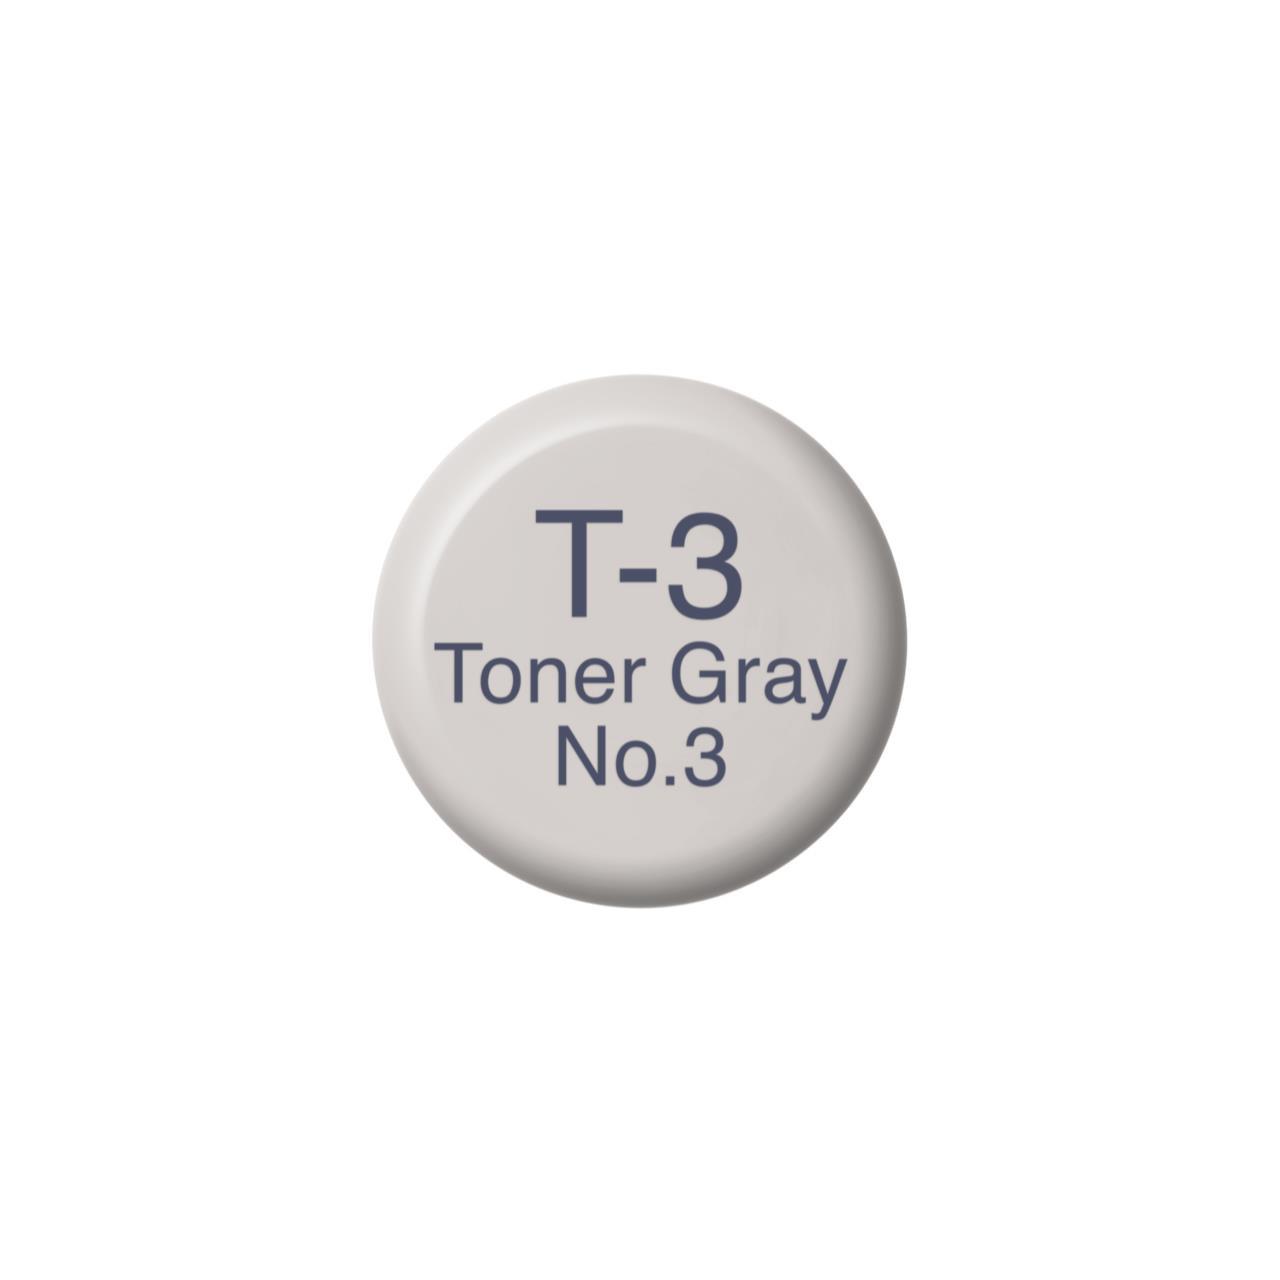 T3 Toner Gray 3, Copic Ink - 4511338055571